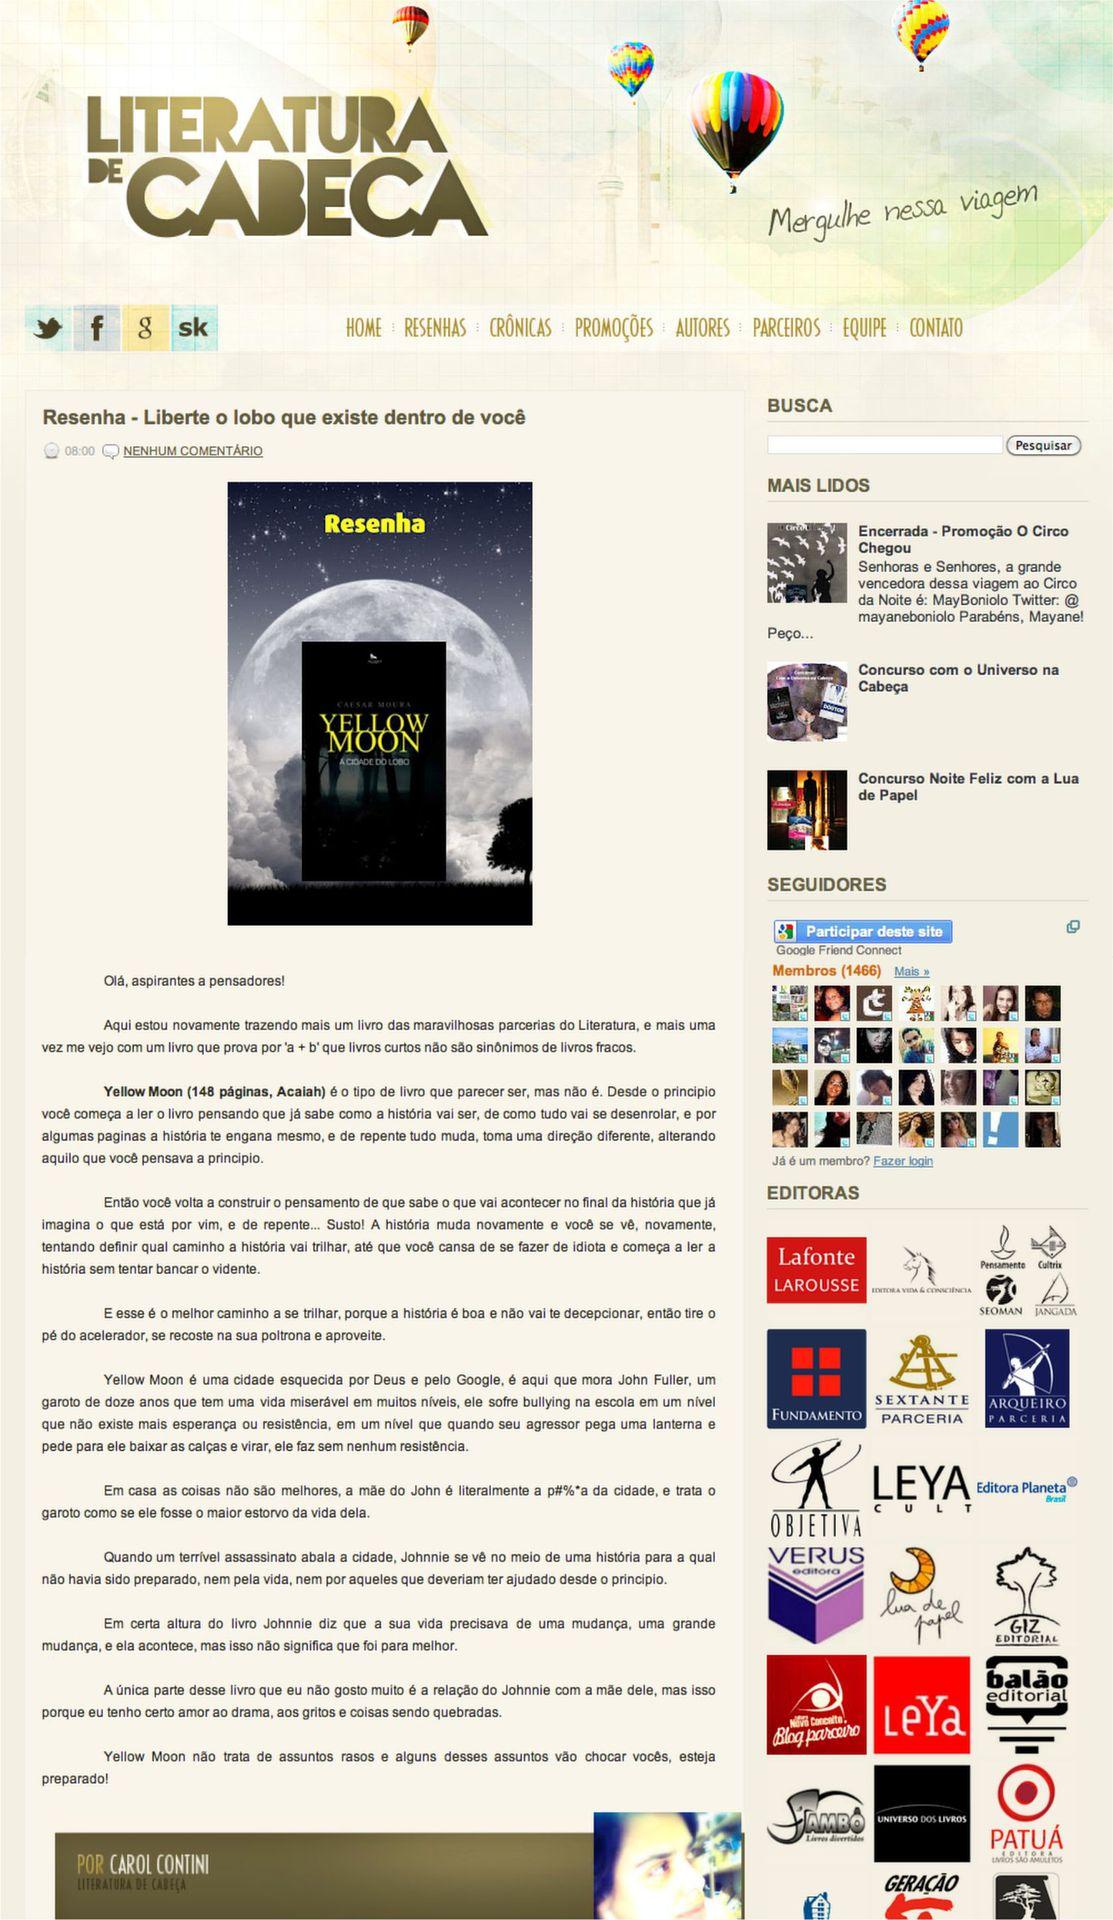 literatura+de+cabeça+cllipping.jpg